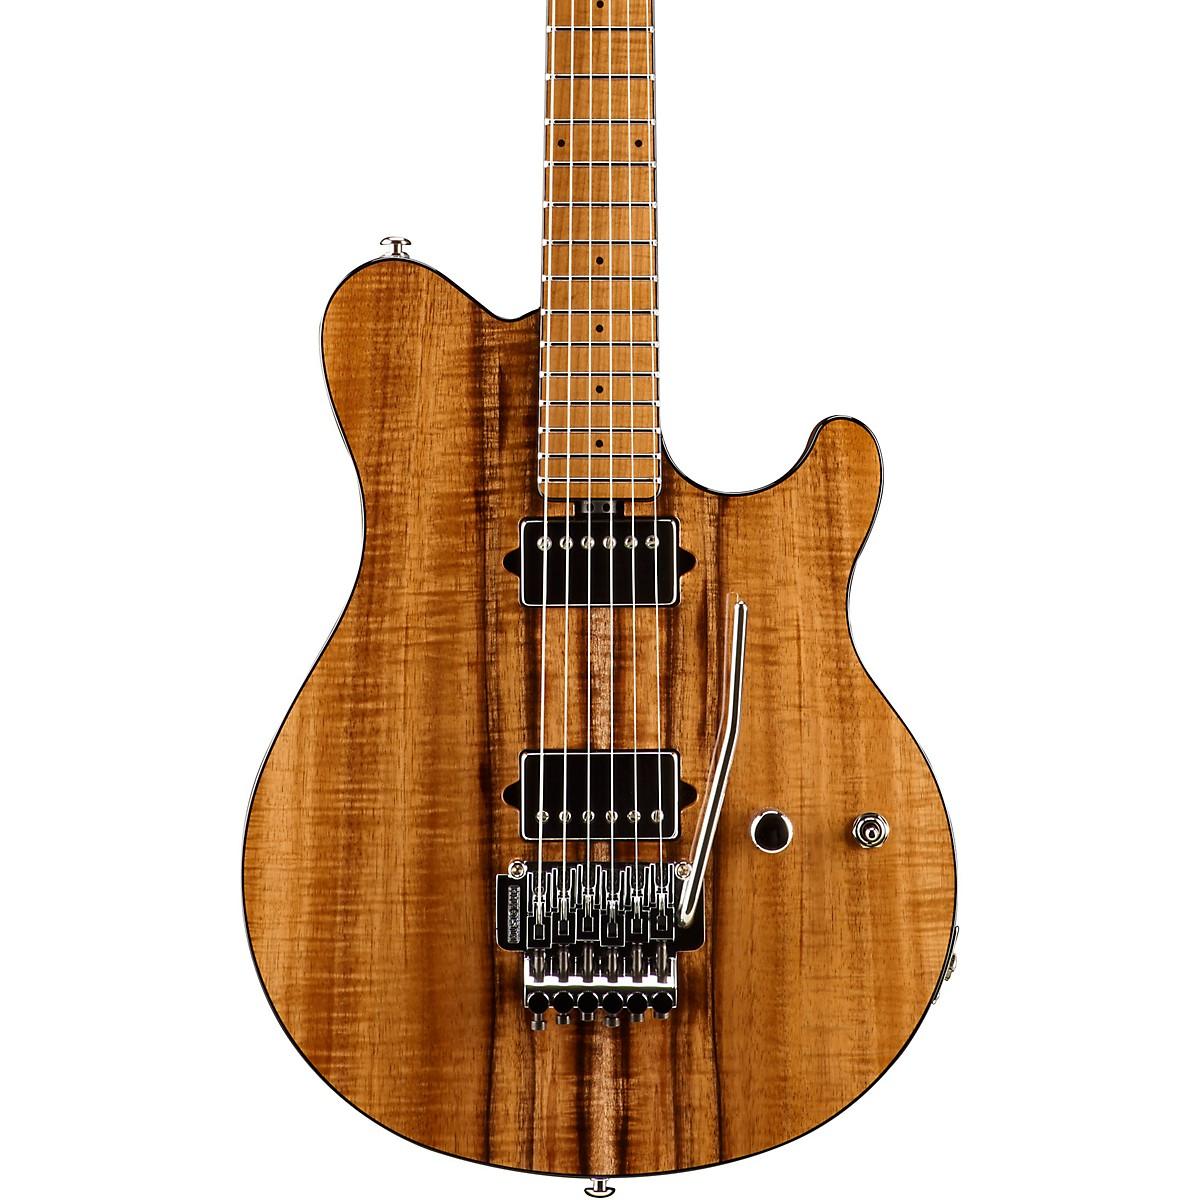 Ernie Ball Music Man BFR Axis Electric Guitar with Koa Top and Mahogany Back